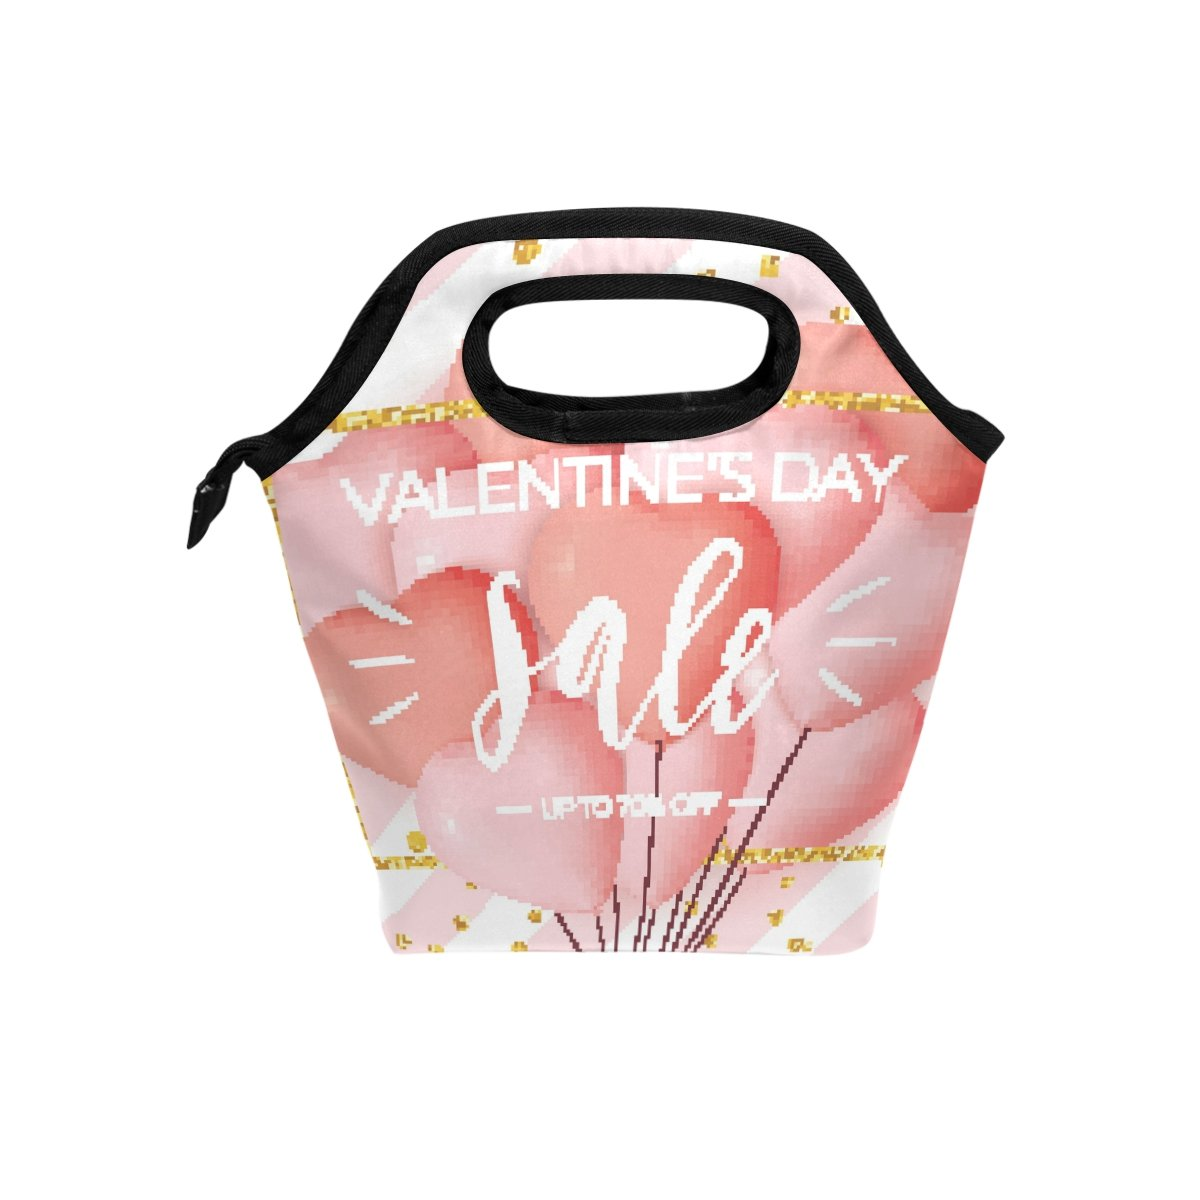 JSTEL Happy Valentine's Day - Bolsa de almuerzo, bolsa de almuerzo, contenedor de alimentos para gourmet Bento, bolsa térmica para viajes, picnic, escuela, oficina bolsa térmica para viajes